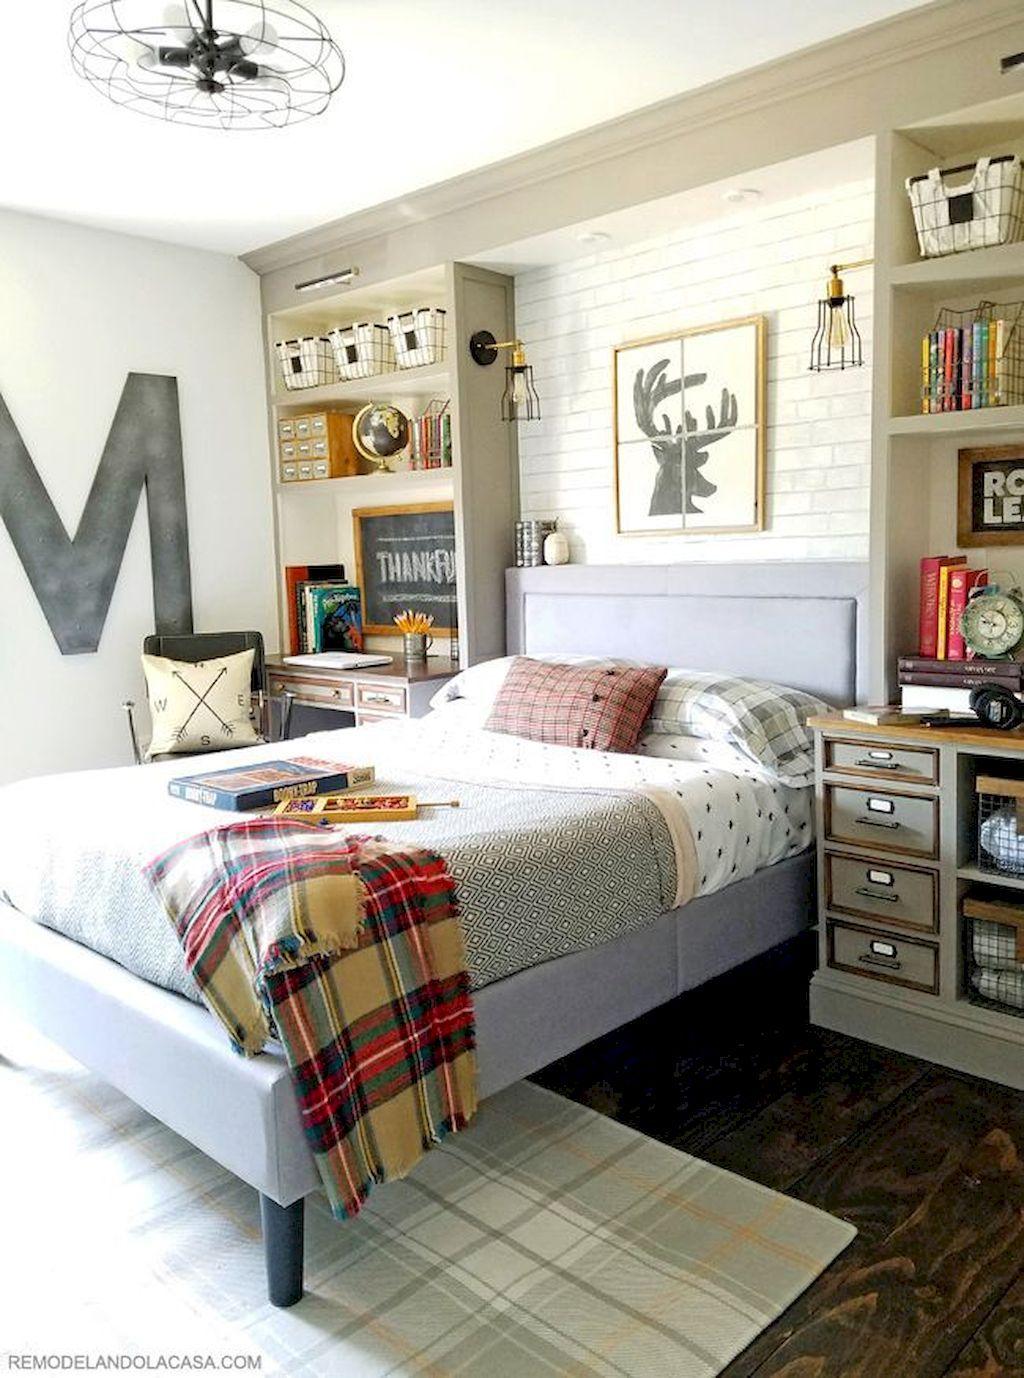 Top 25 Farmhouse Home Decor Ideas In 2020 Bedroom Layouts Boys Bedroom Furniture Boy Bedroom Design